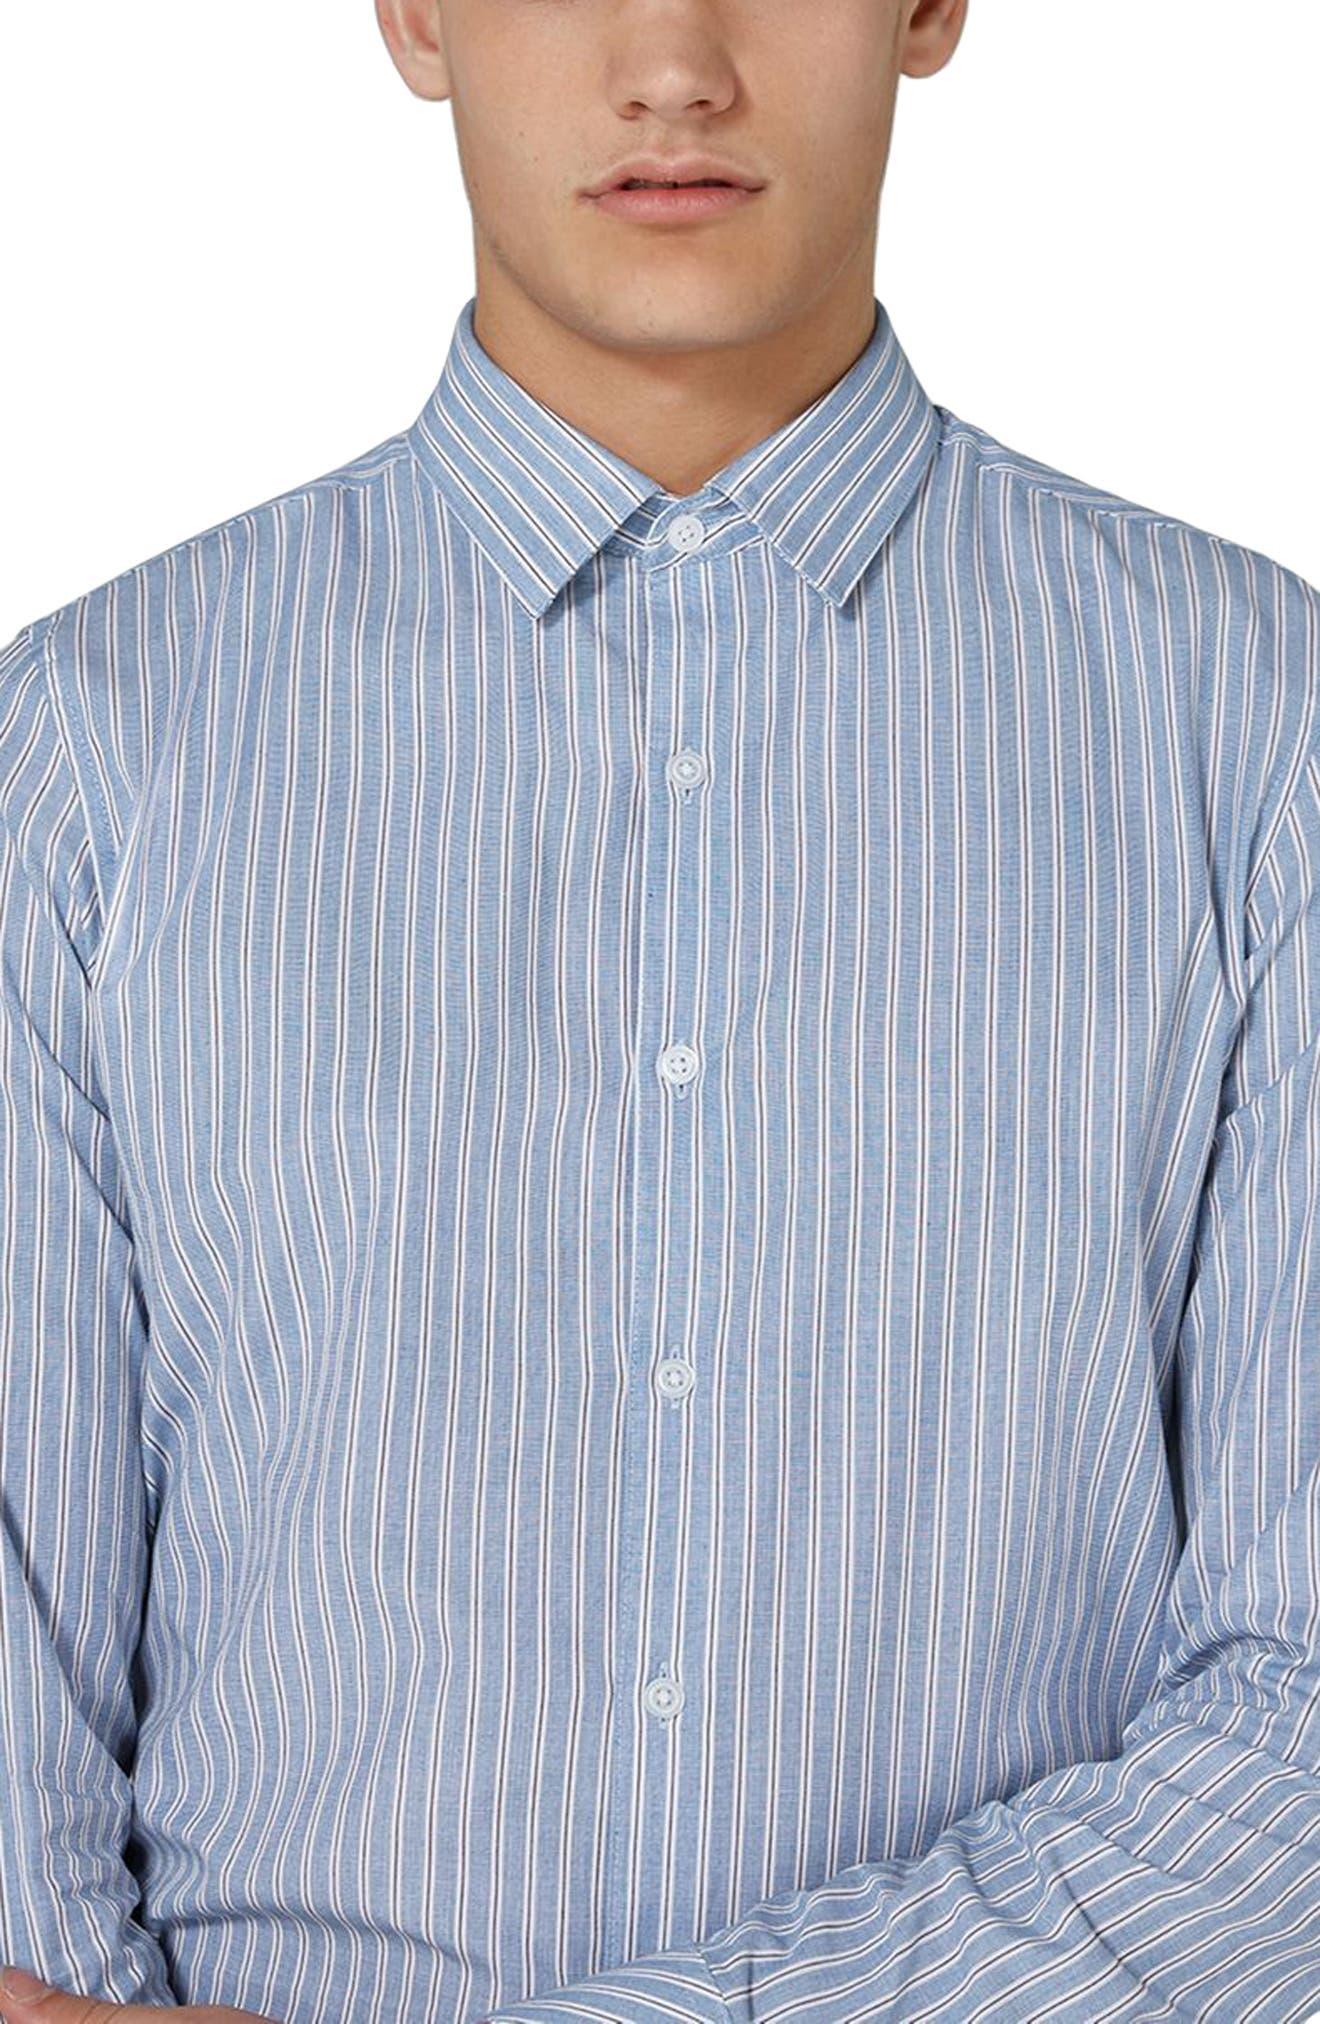 Classic Fit Stripe Smart Shirt,                             Alternate thumbnail 3, color,                             Blue Multi